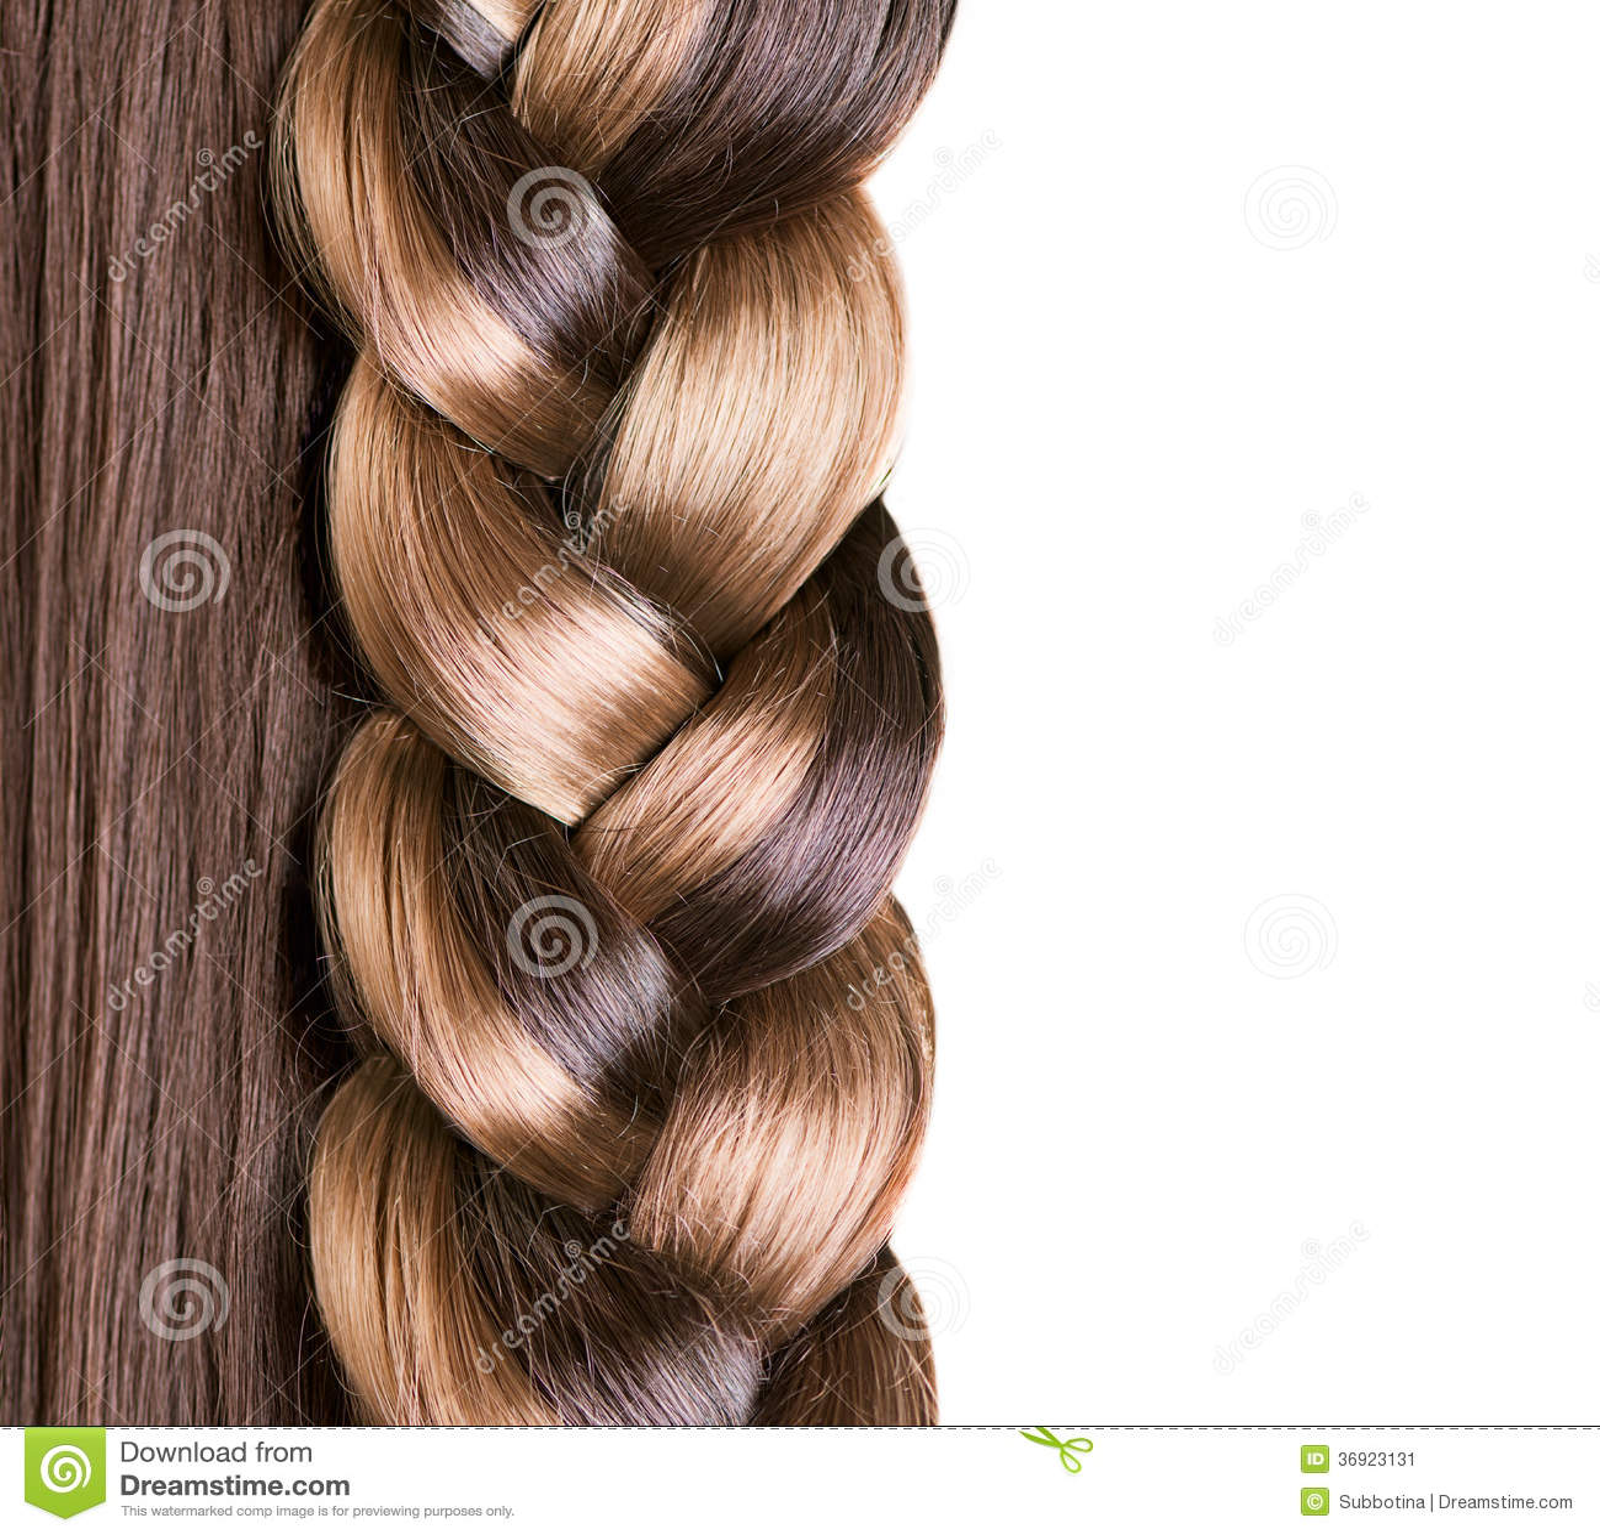 Braid Hairstyle Stock Image Image 36923131